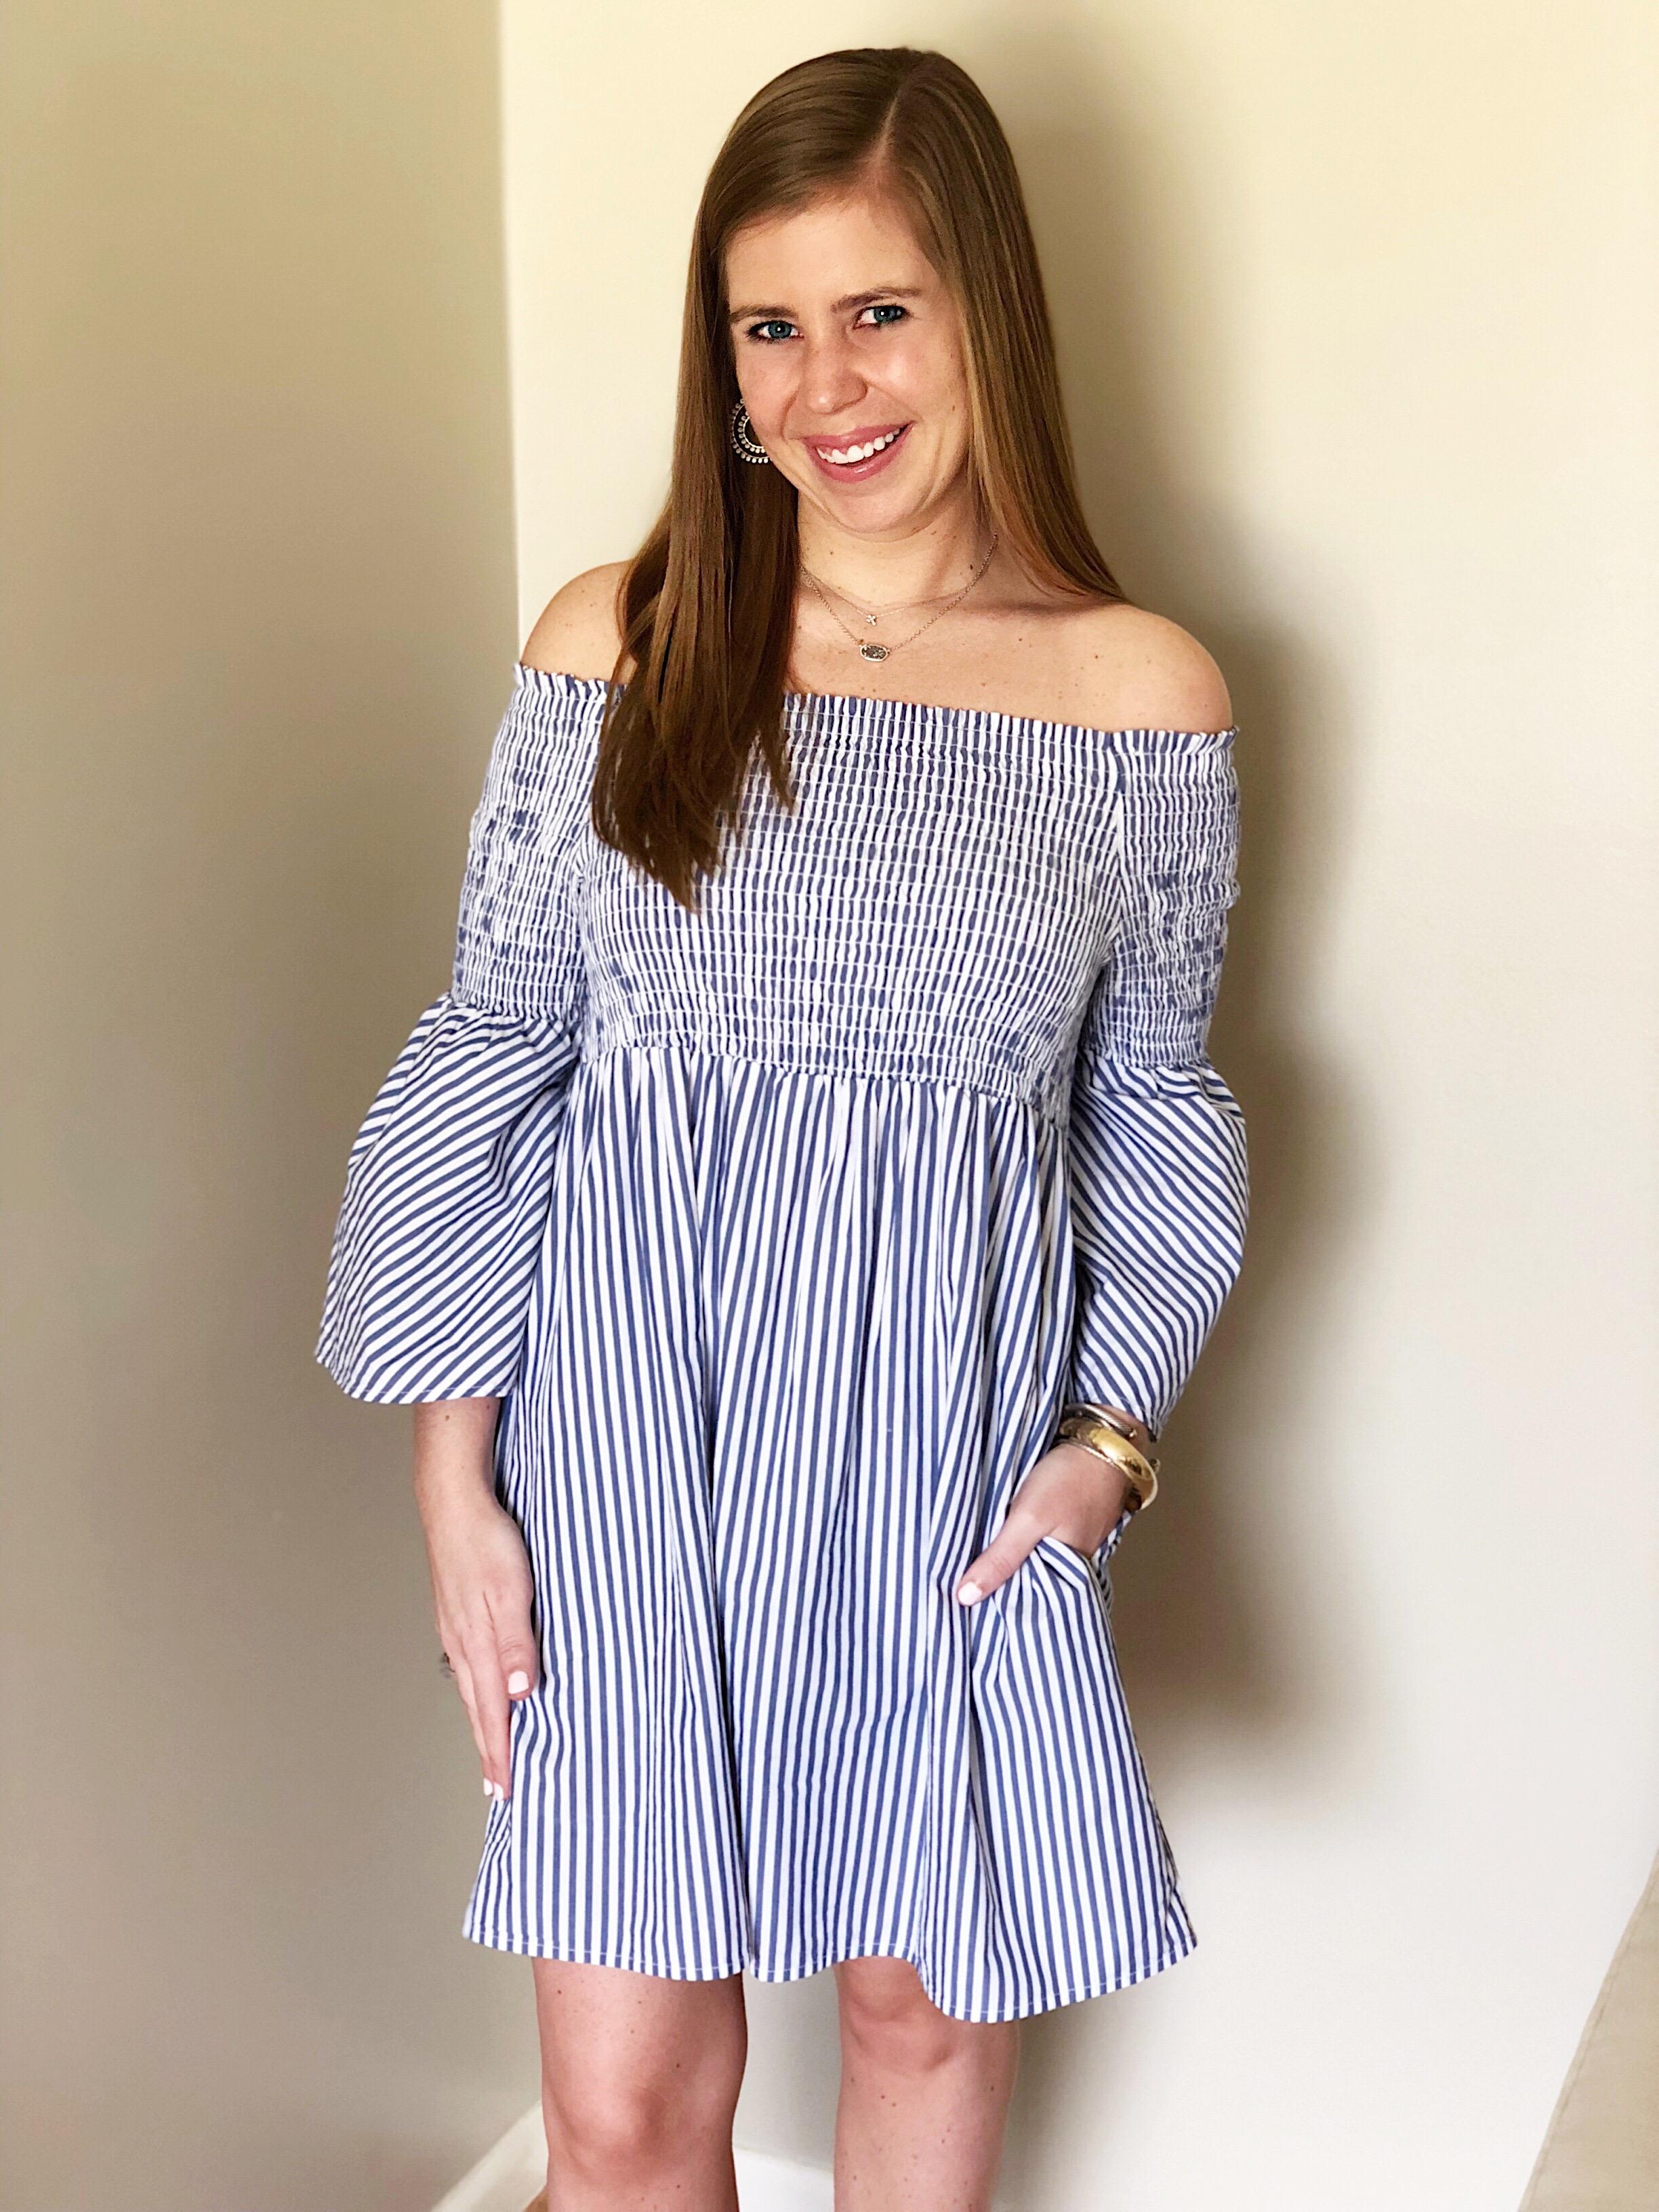 Option 2-   Blue & White Striped Dress